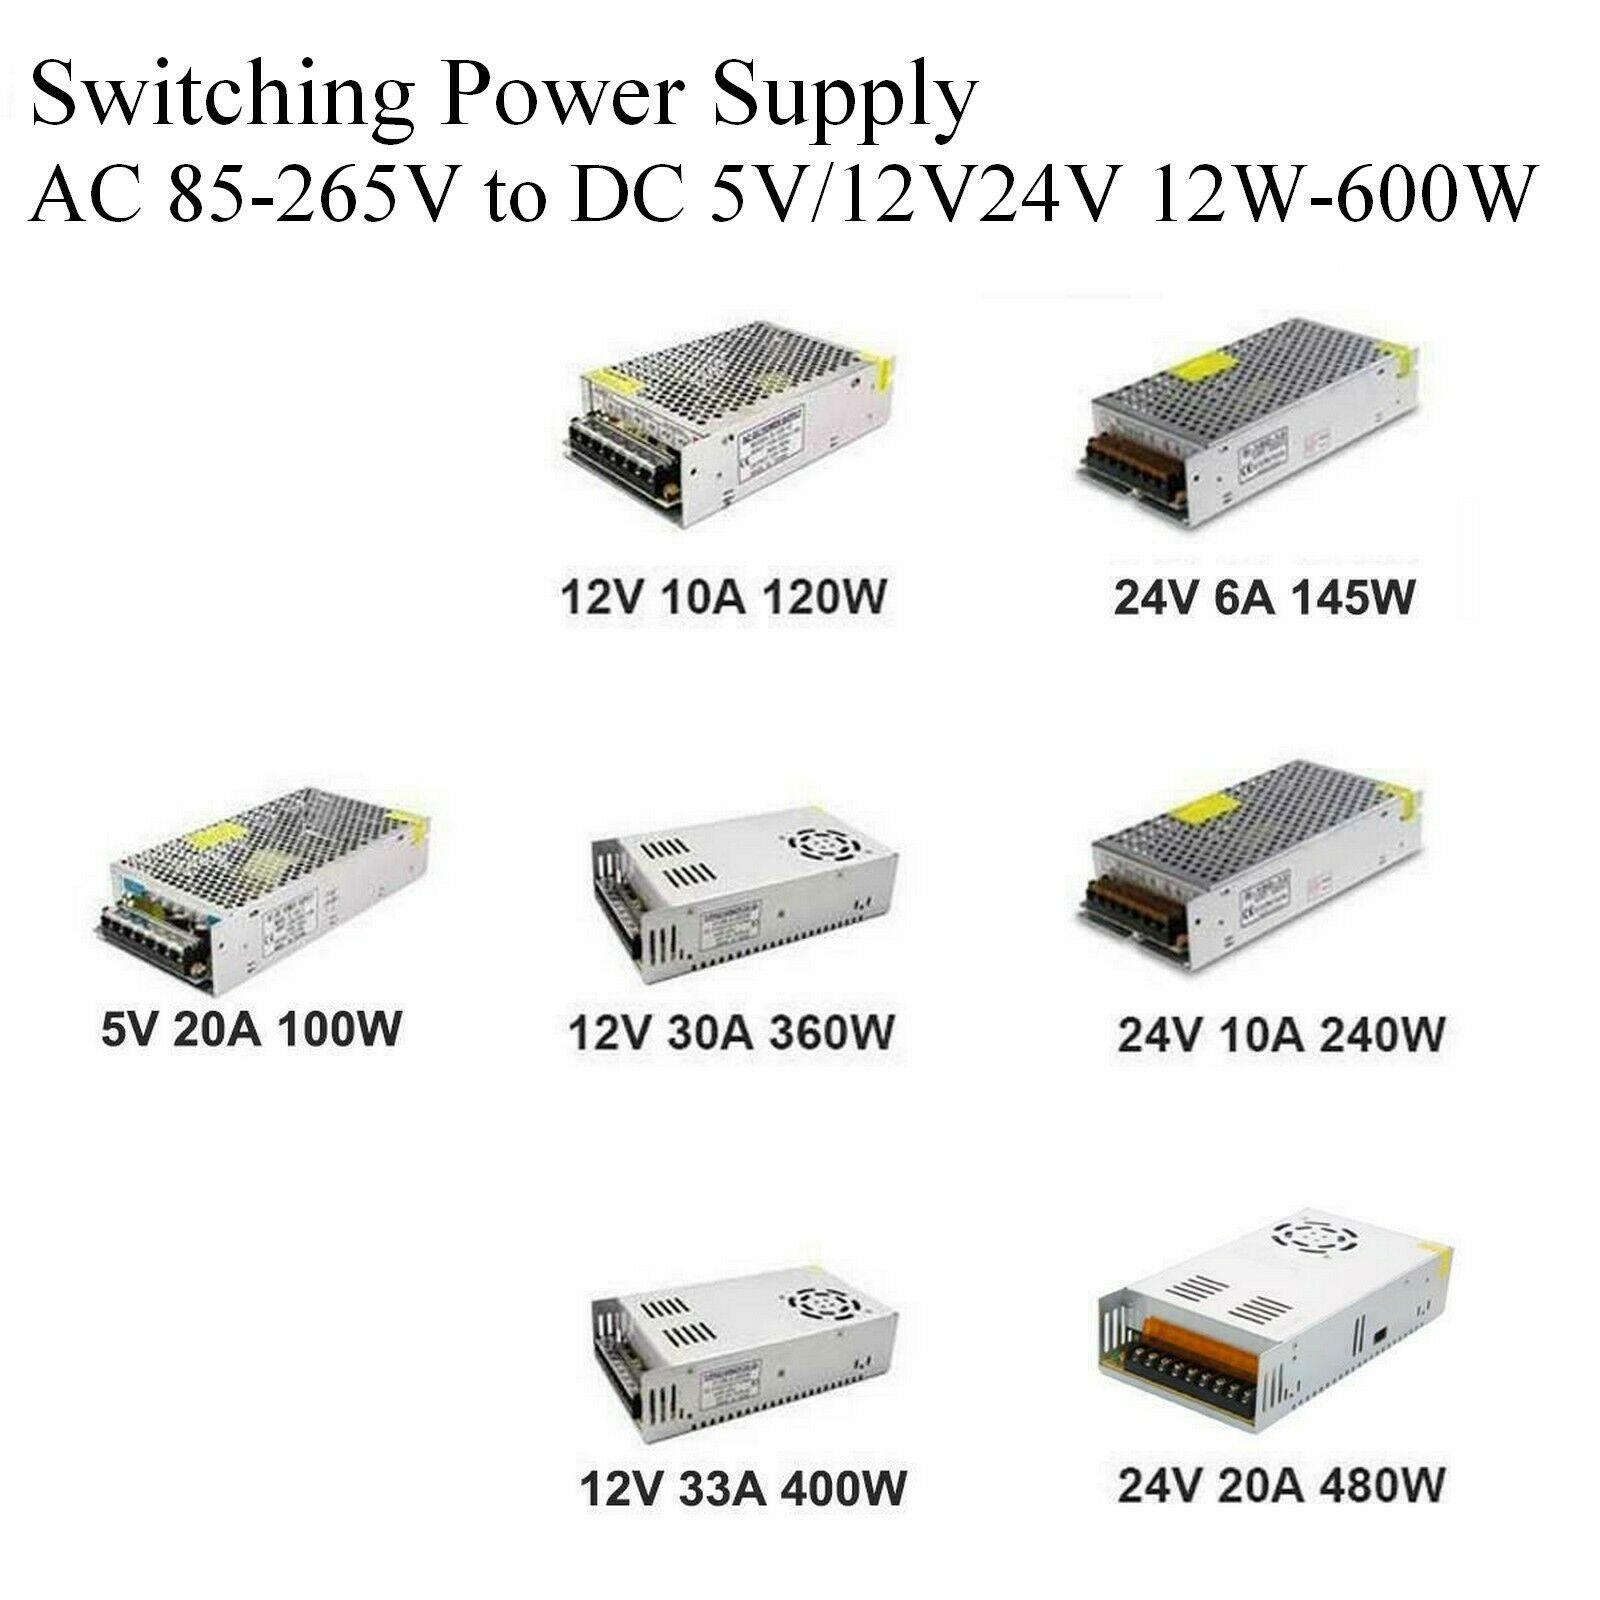 AC DC 5V 12V источник питания 24 V 48V Fonte 500W трансформаторы 220V до 5 12 24 V источник питания 5V 12V 24 V SMPS Mean well